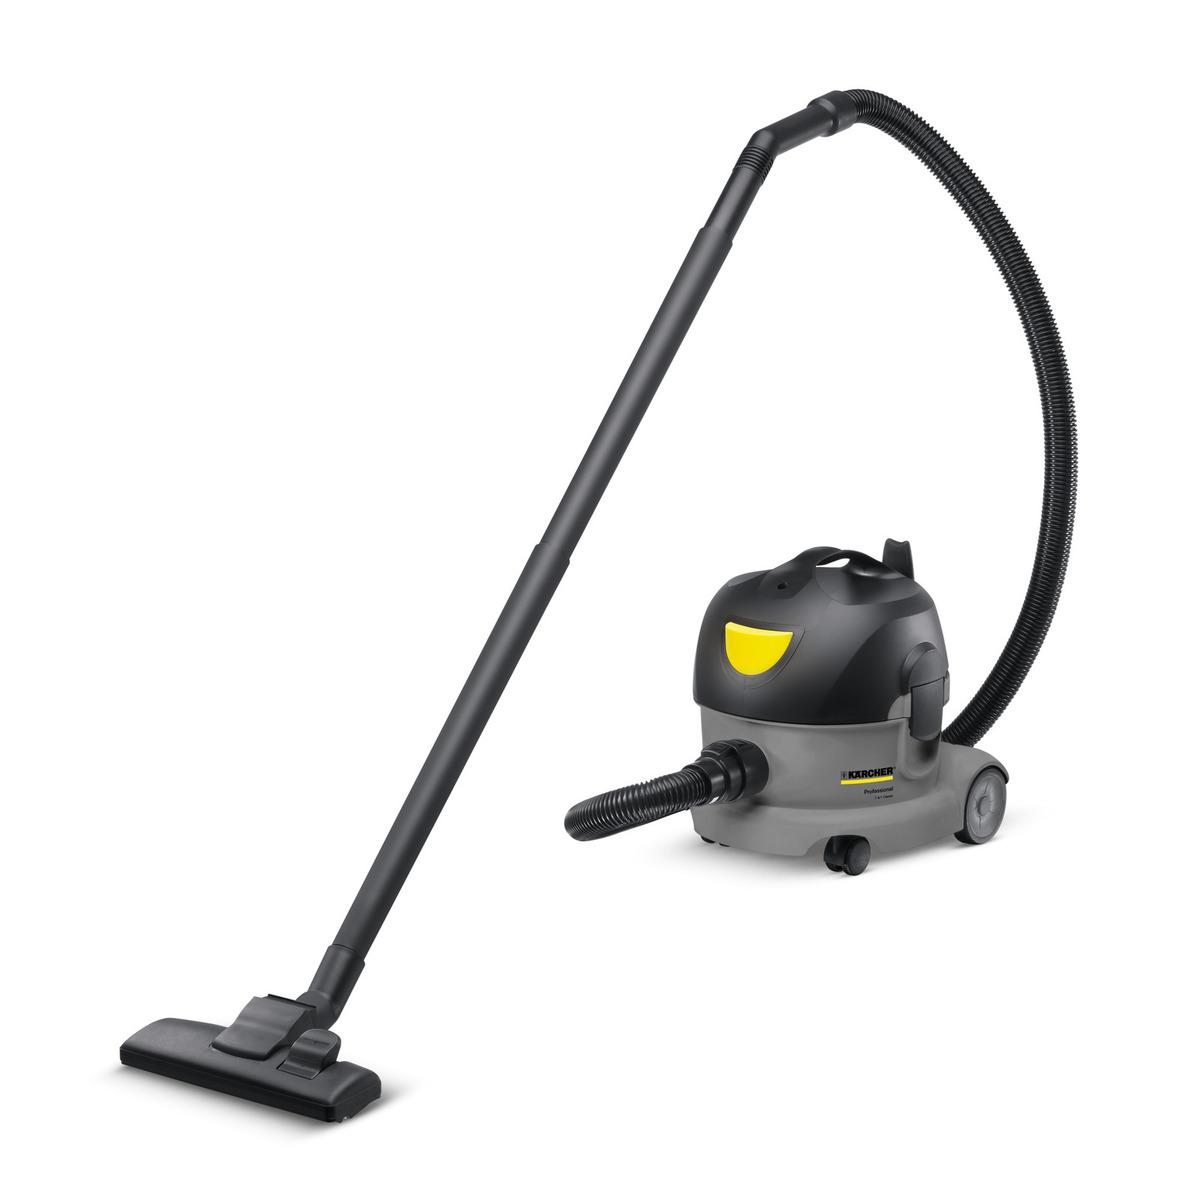 Karcher Dry Vacuum Cleaner T8/1